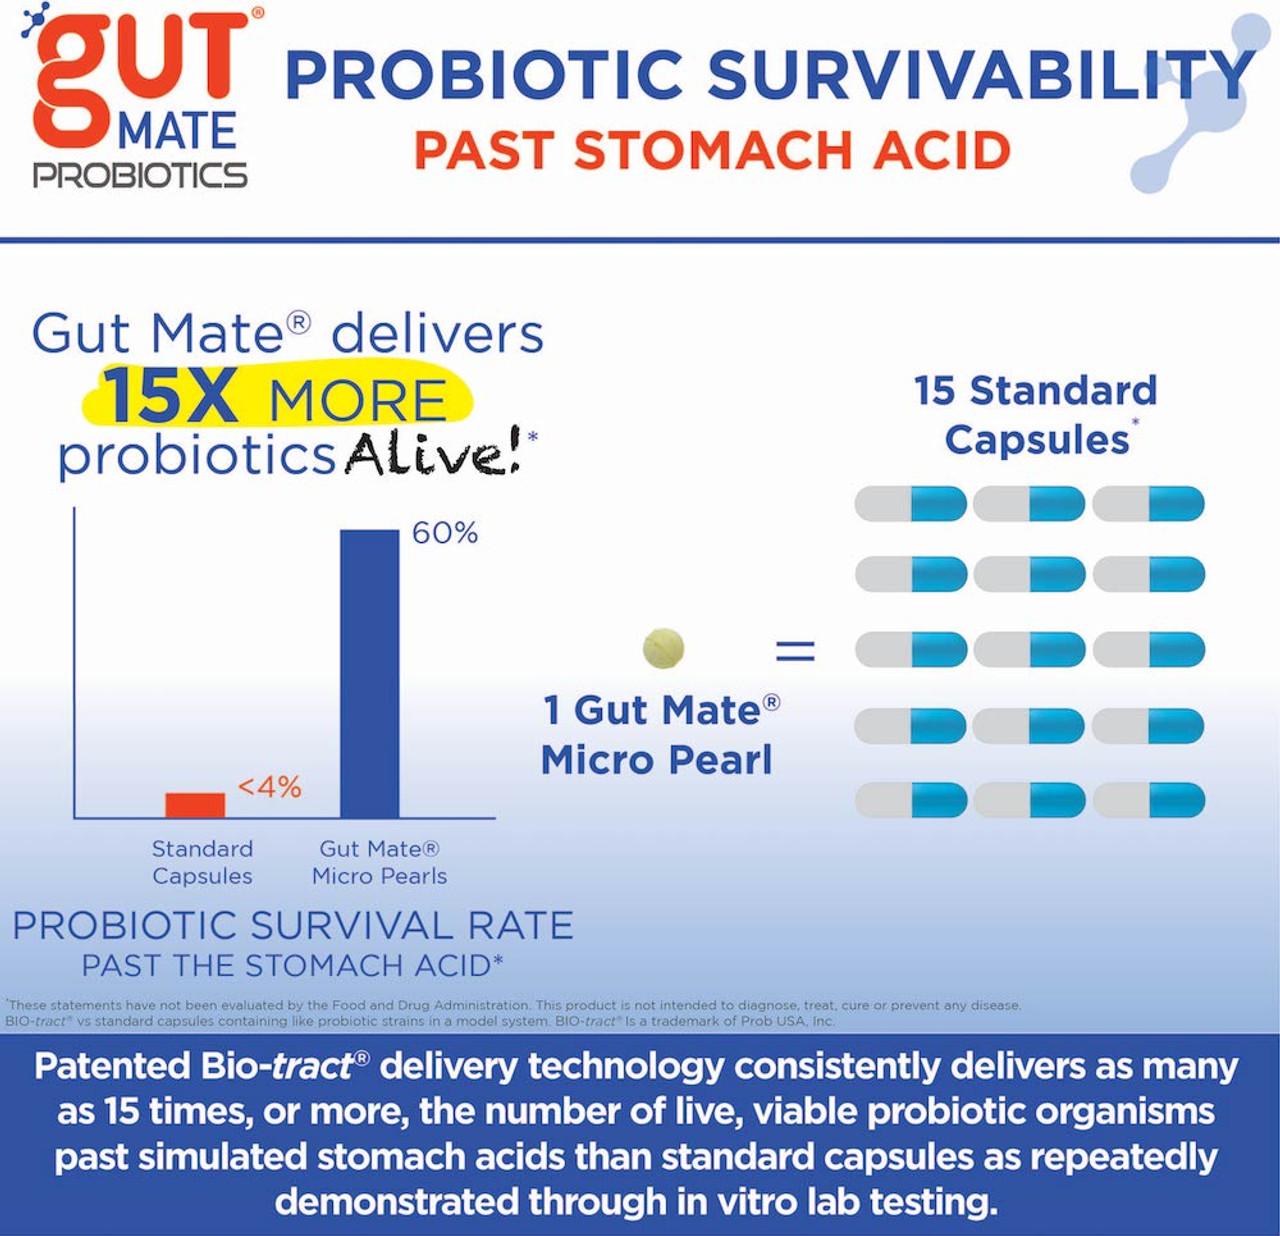 1 Gut Mate® Bio-tract® Micro Pearl = 15 Standard capsules